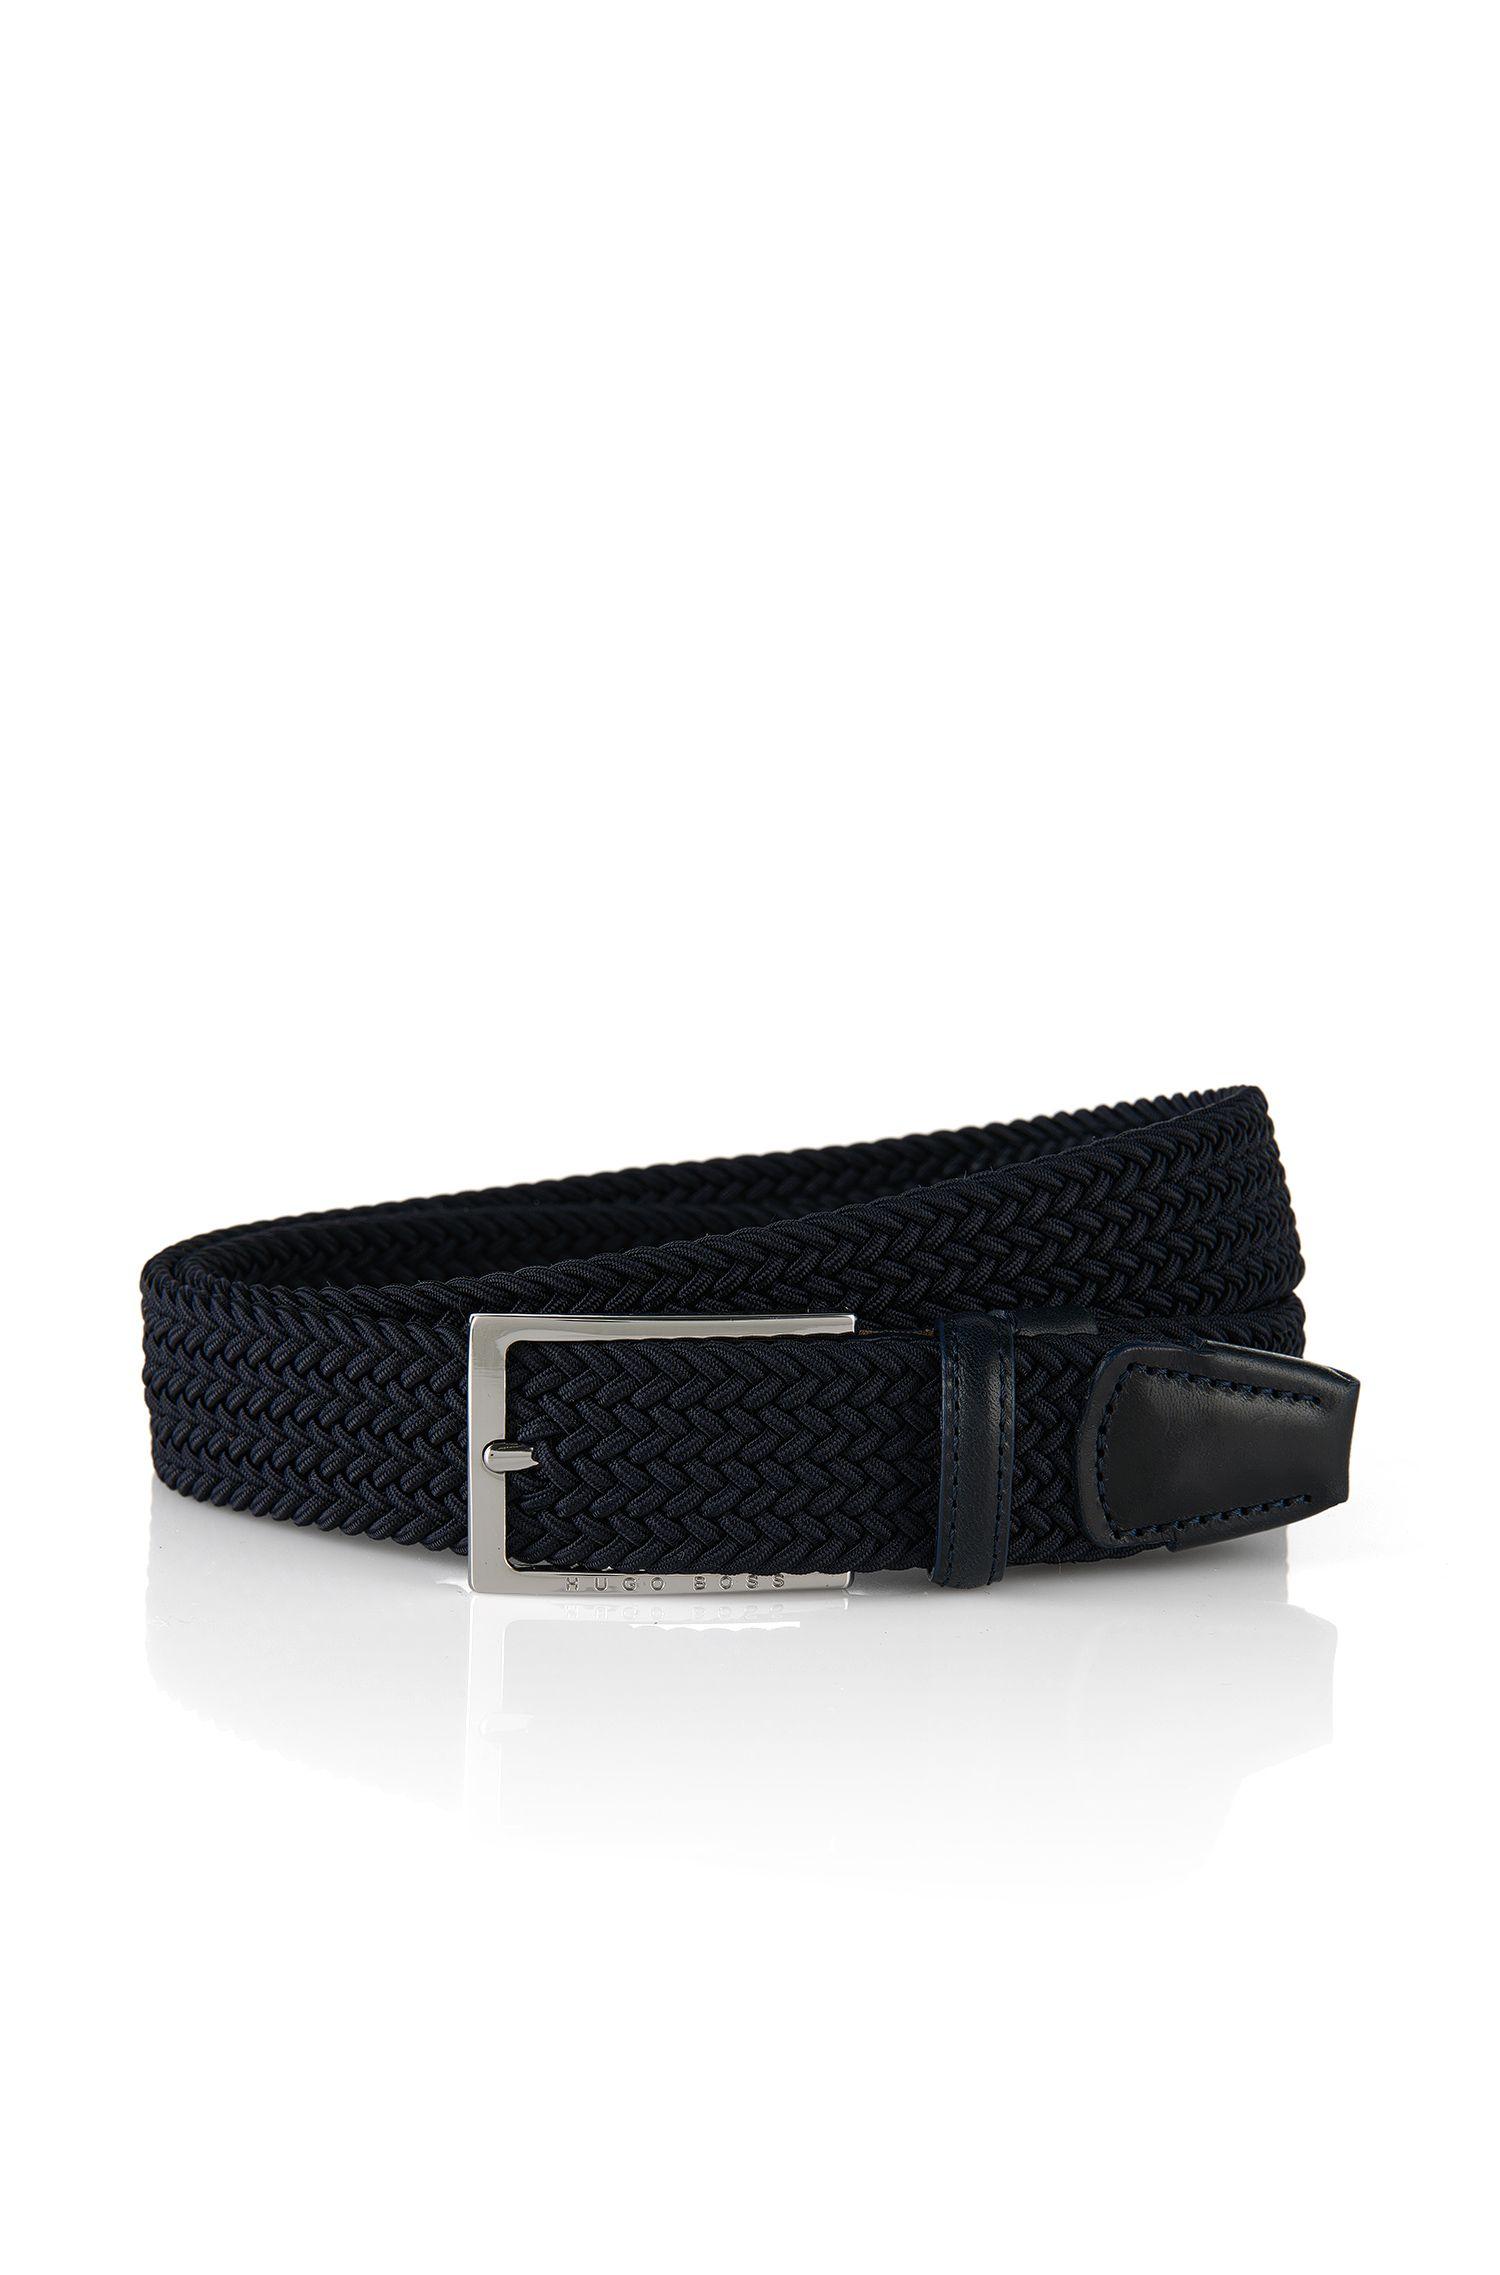 'Clori' | Cotton Blend Leather Braided Belt